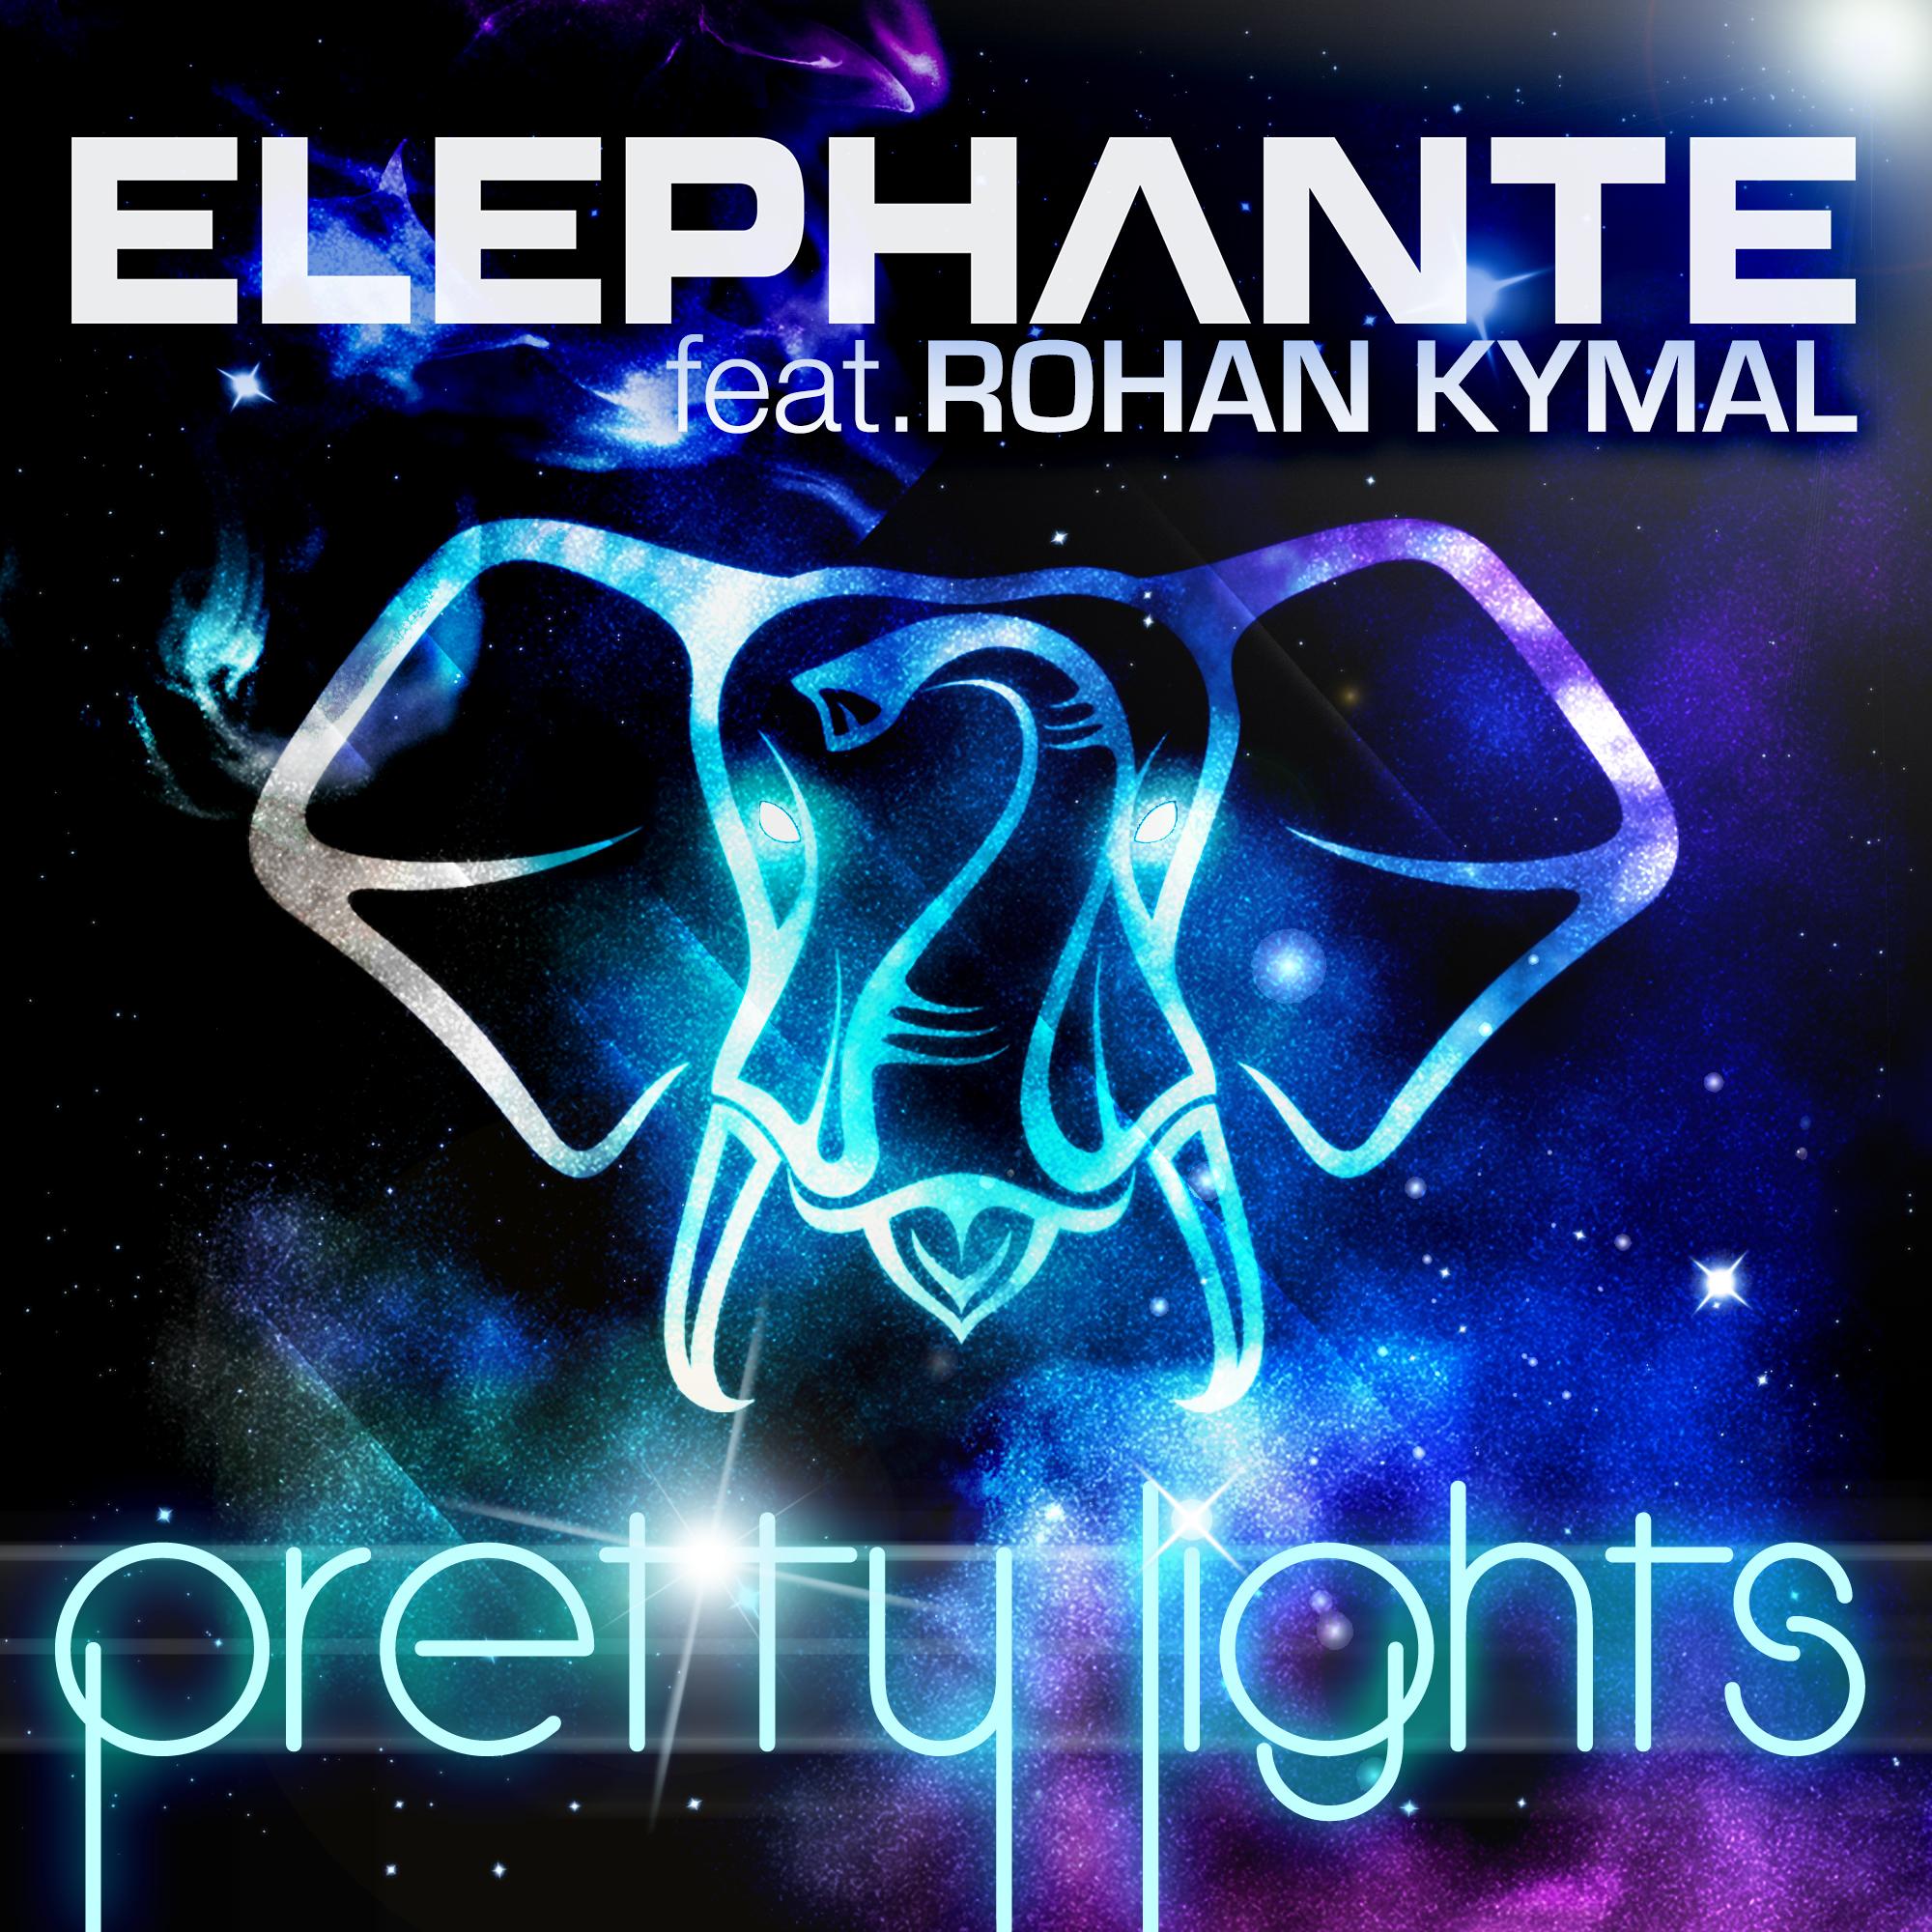 Elephante feat. Rohan Kymal - Pretty Lights album art high res